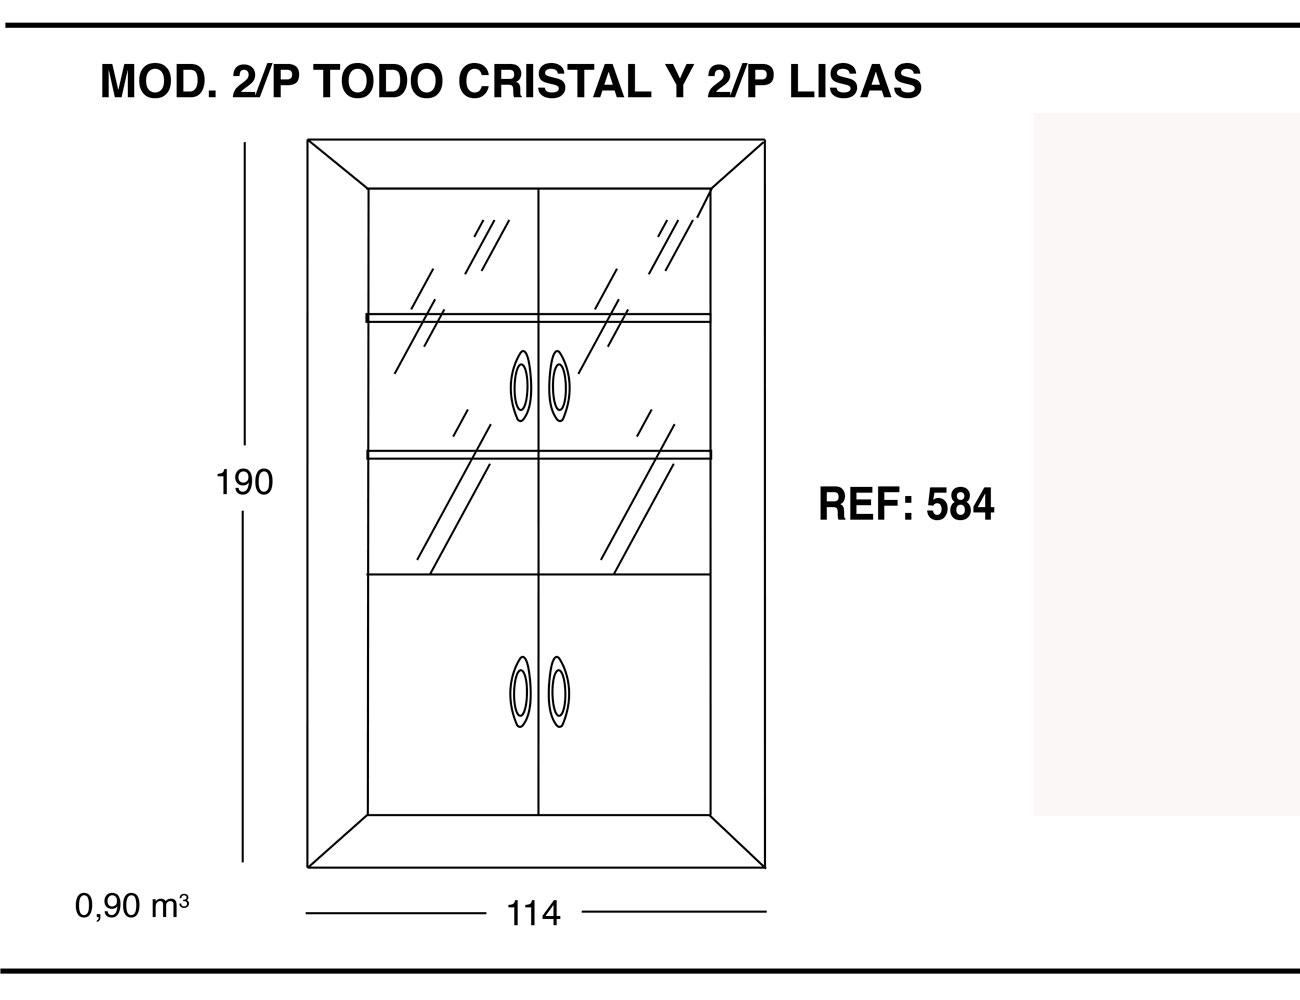 Modulo 2 puertas todo cristal 2p lisas 190 114